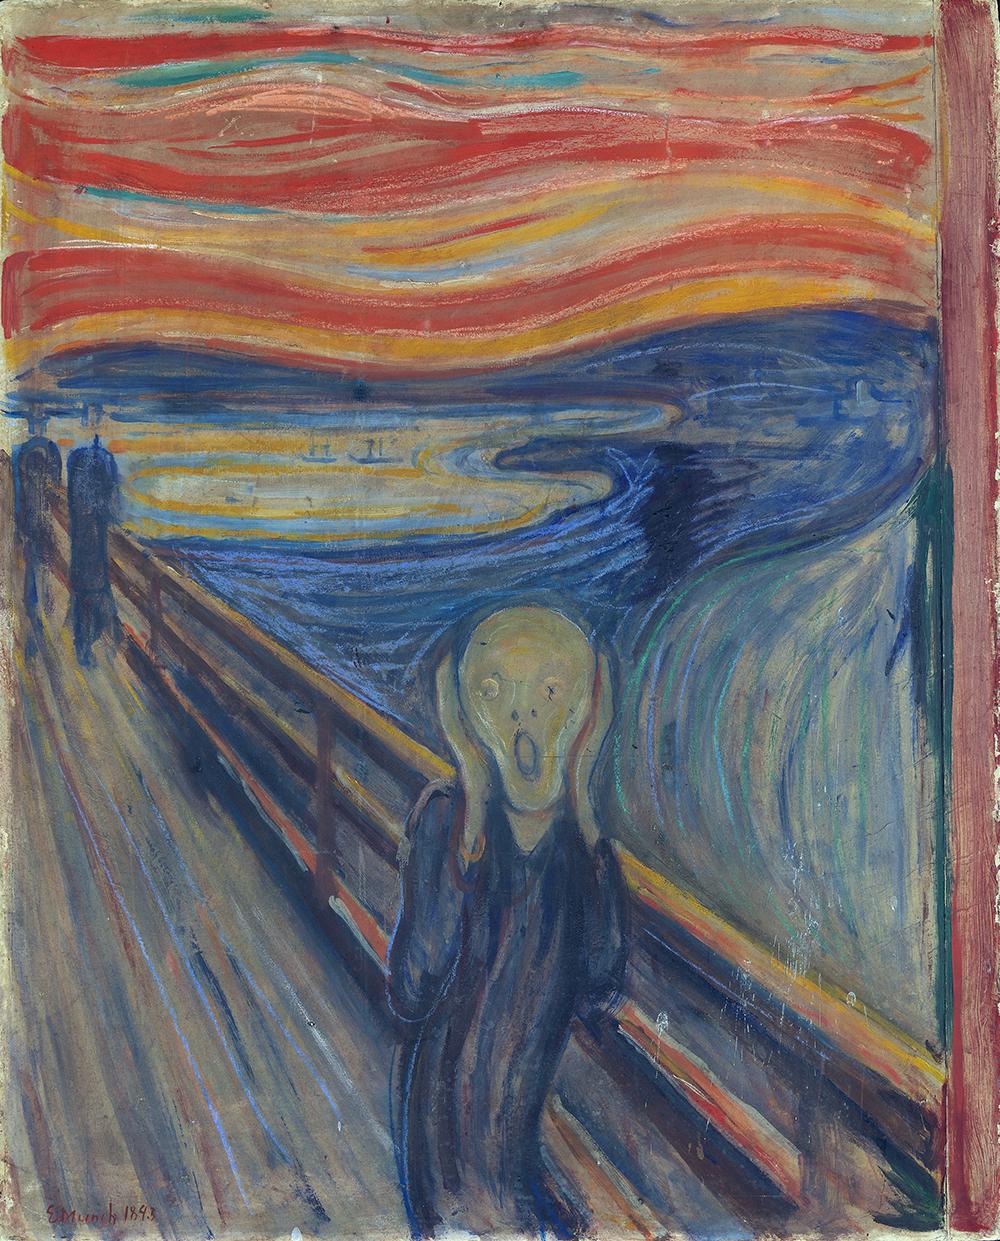 Edvard Munch 1893 The Scream